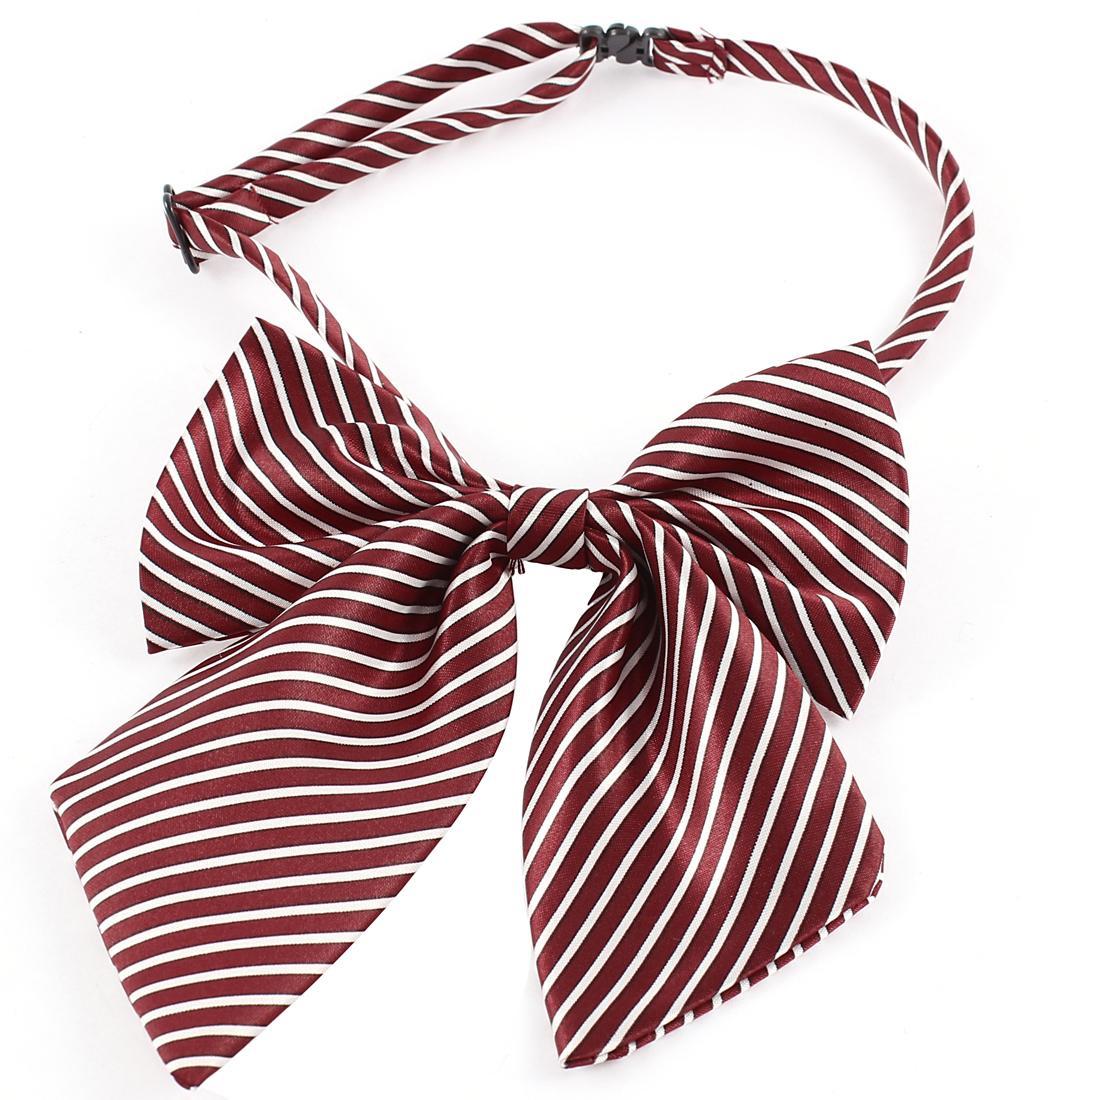 Carmine White Stripes Pattern Dog Pug Adjustable Band Belt Plastic Buckle Grooming Necktie Ornament